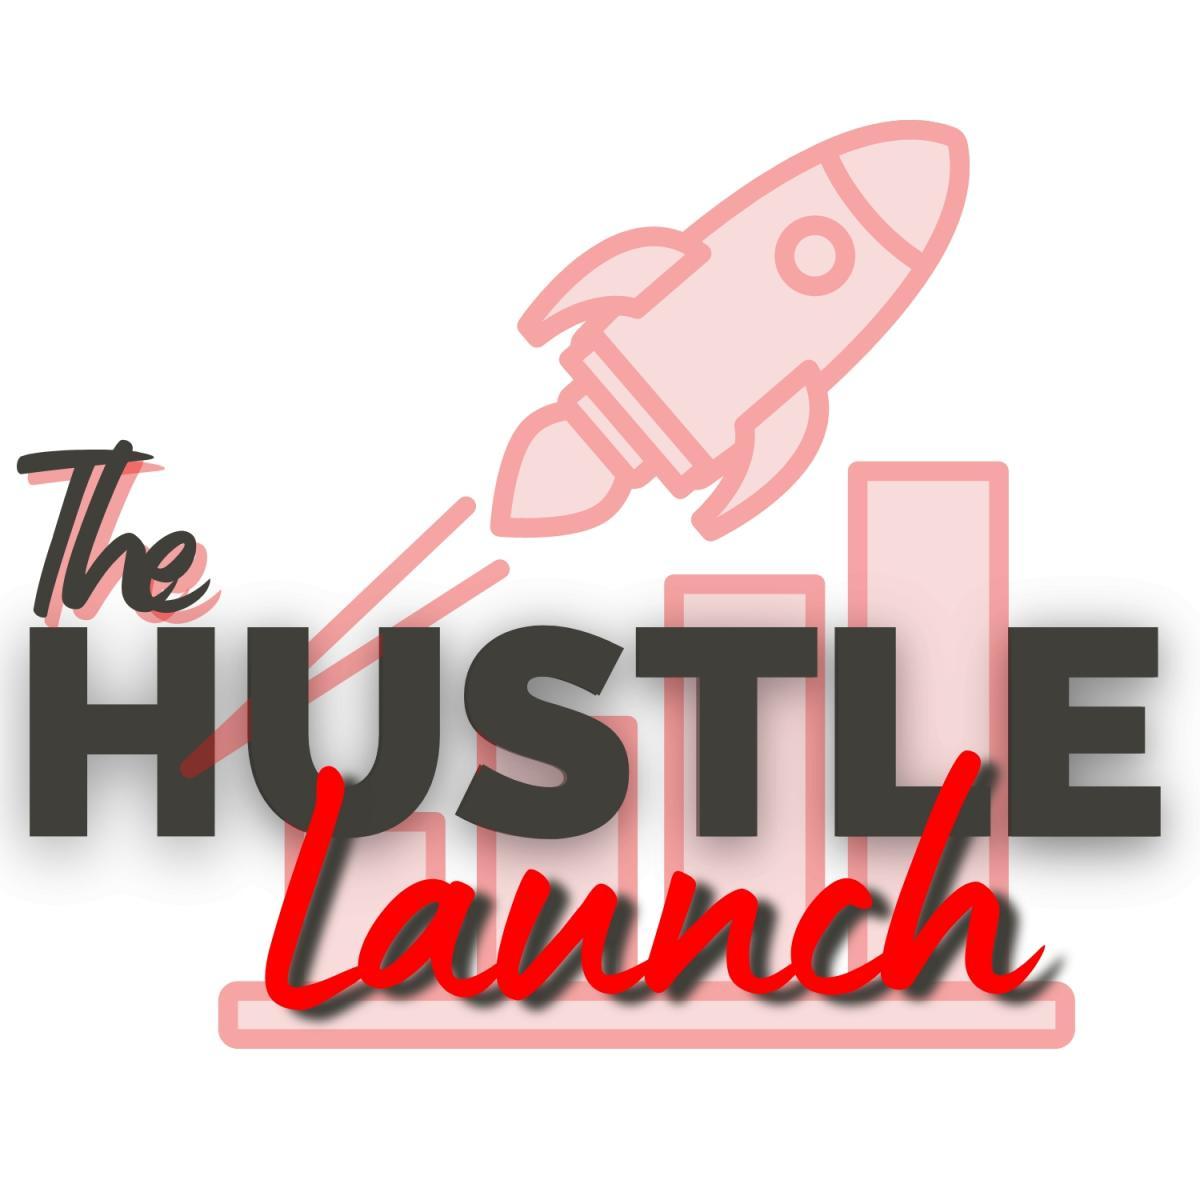 The Hustle Launch